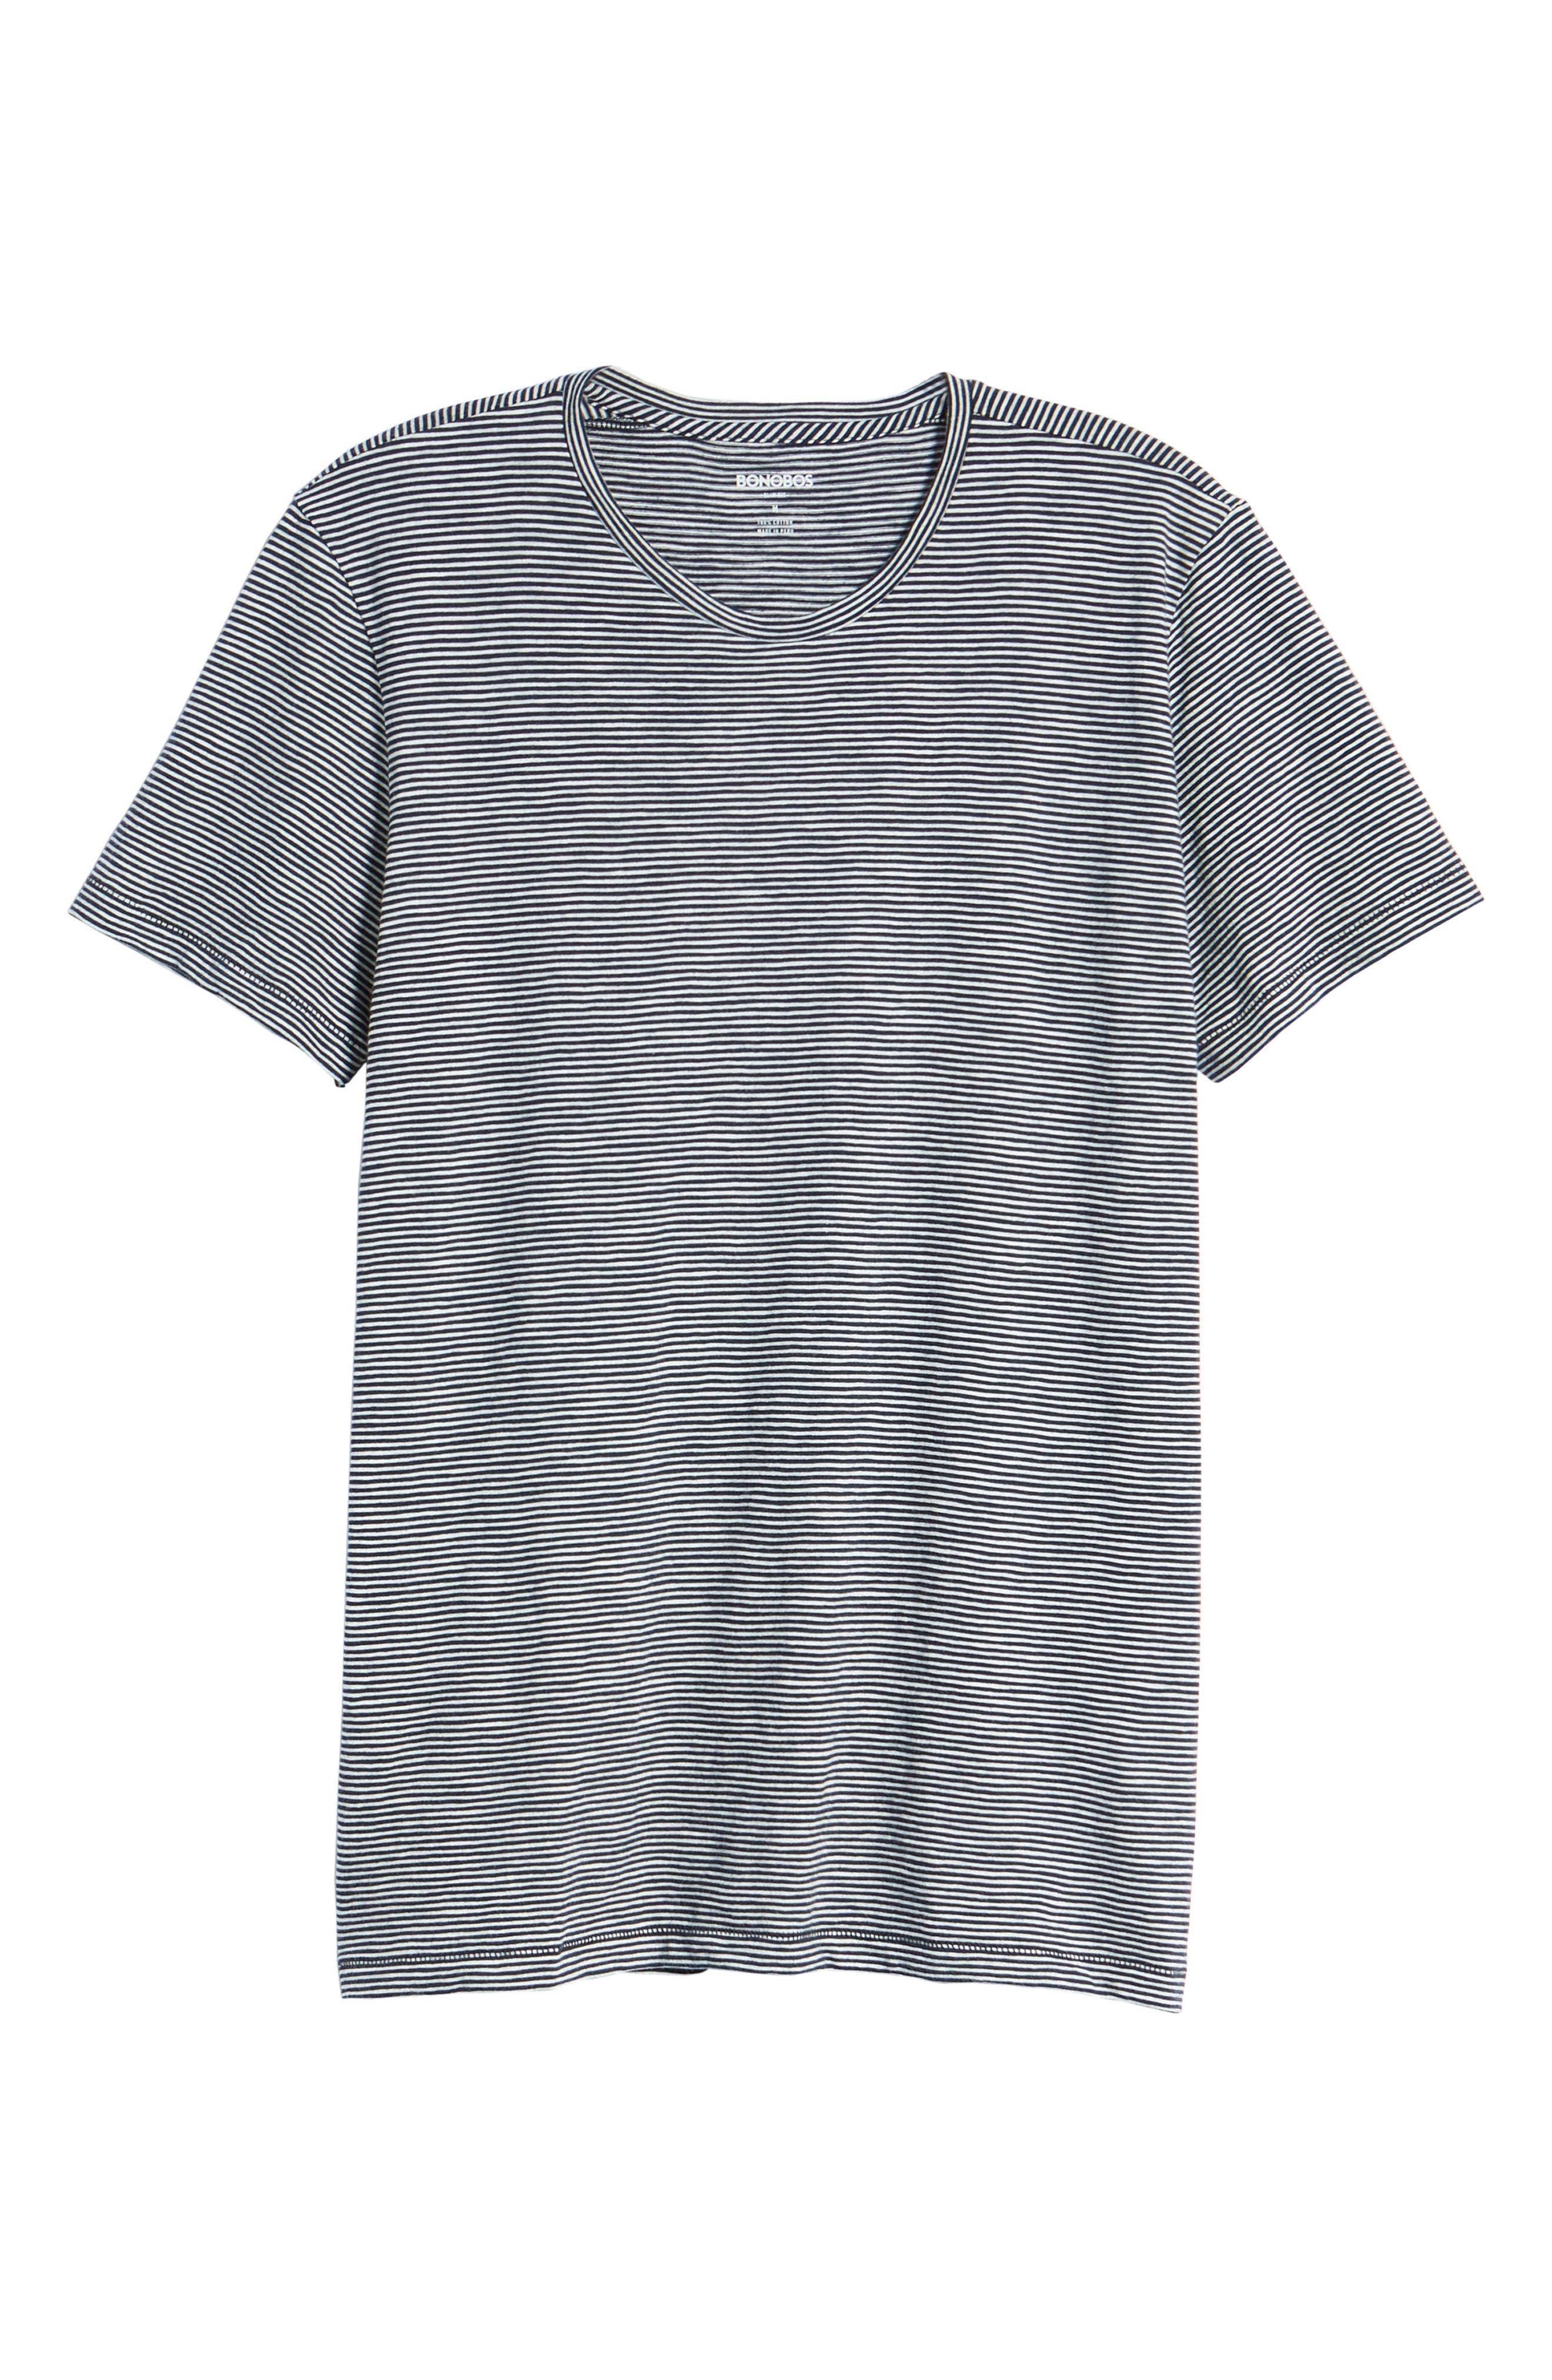 Stripe T-Shirt,                             Alternate thumbnail 6, color,                             Paddleboard Stripe Tee